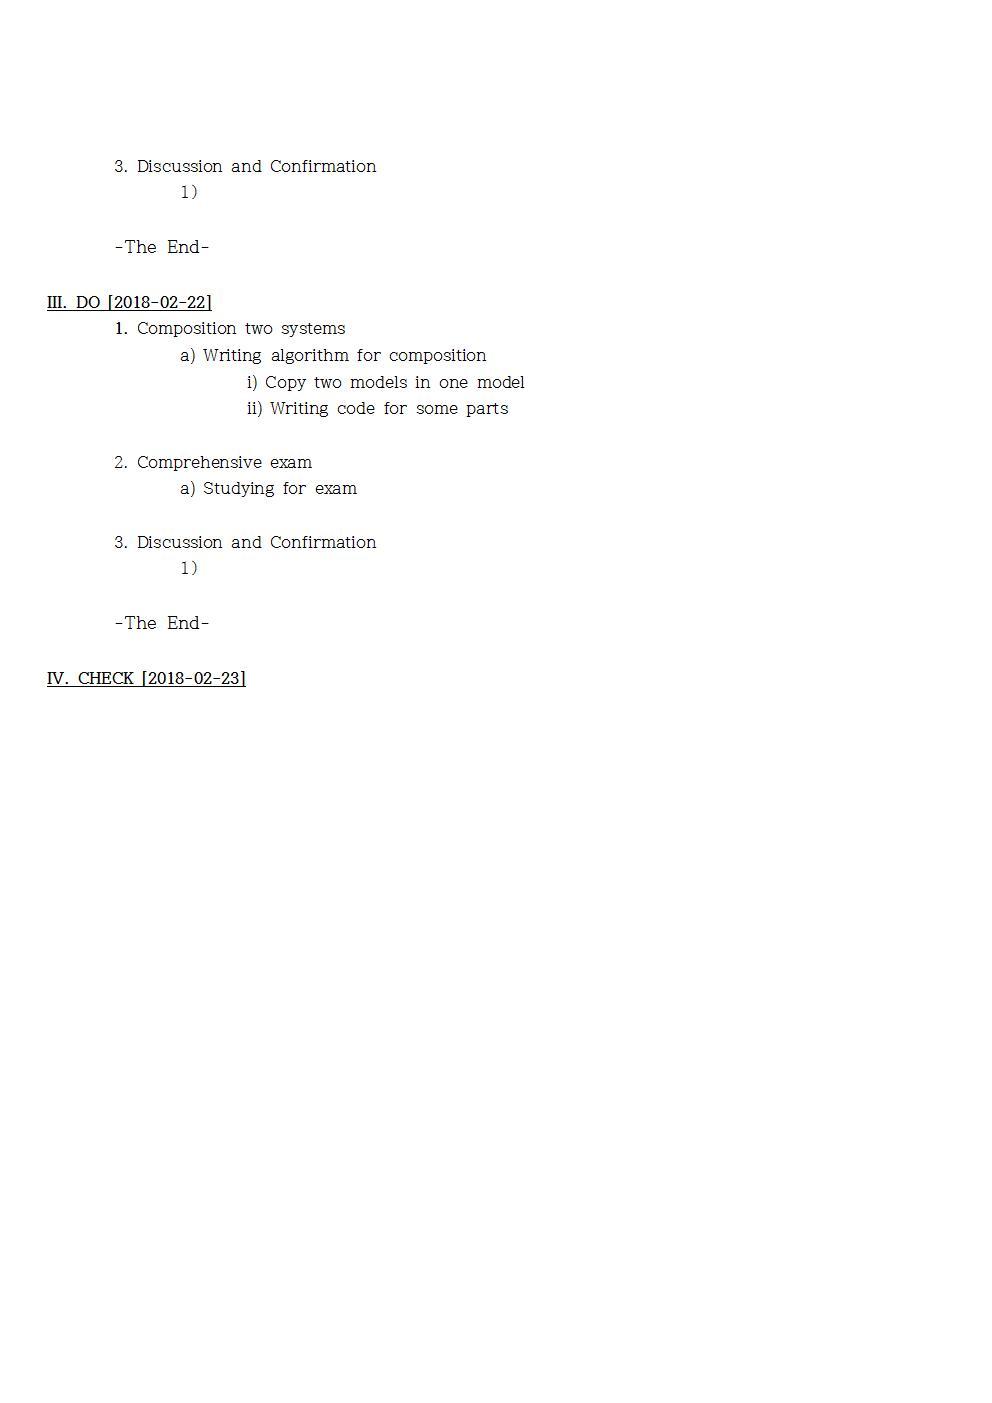 D-[18-002-RD-02]-[PRISM2.0-ADOxx]-[2018-02-22]-[MR]002.jpg